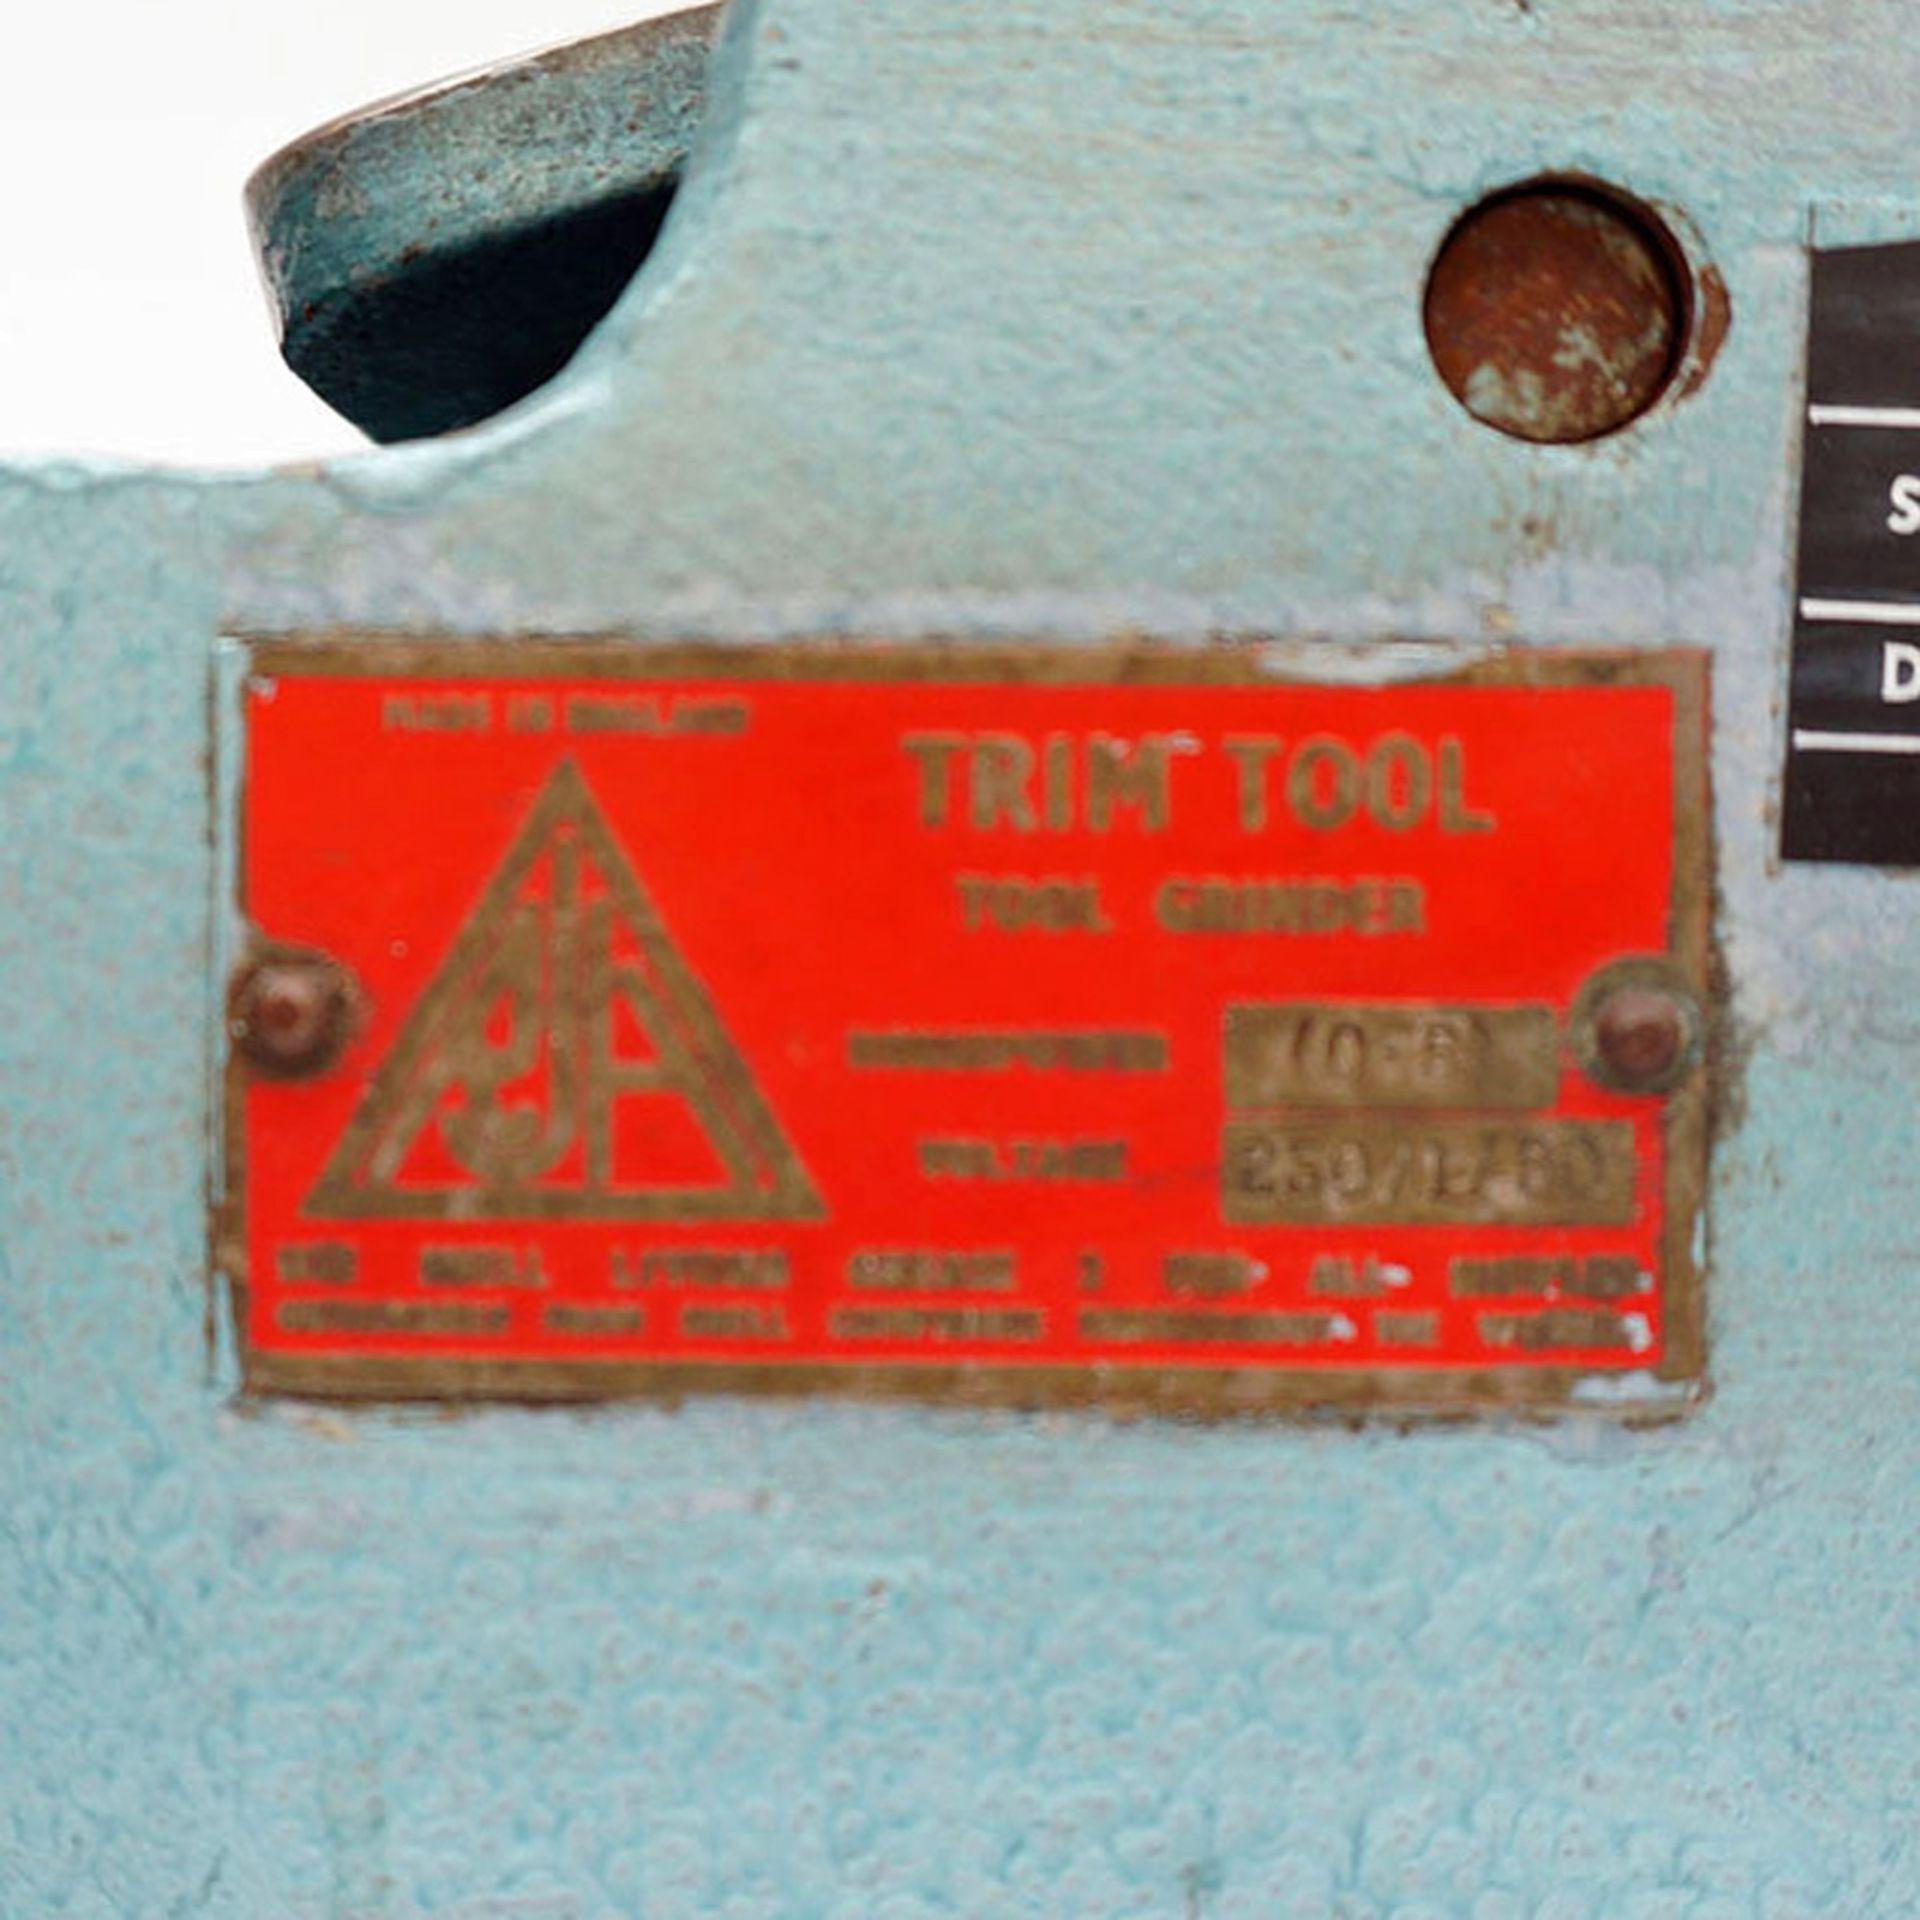 RJH Trim Tool Bench Top Lapper. - Image 4 of 4